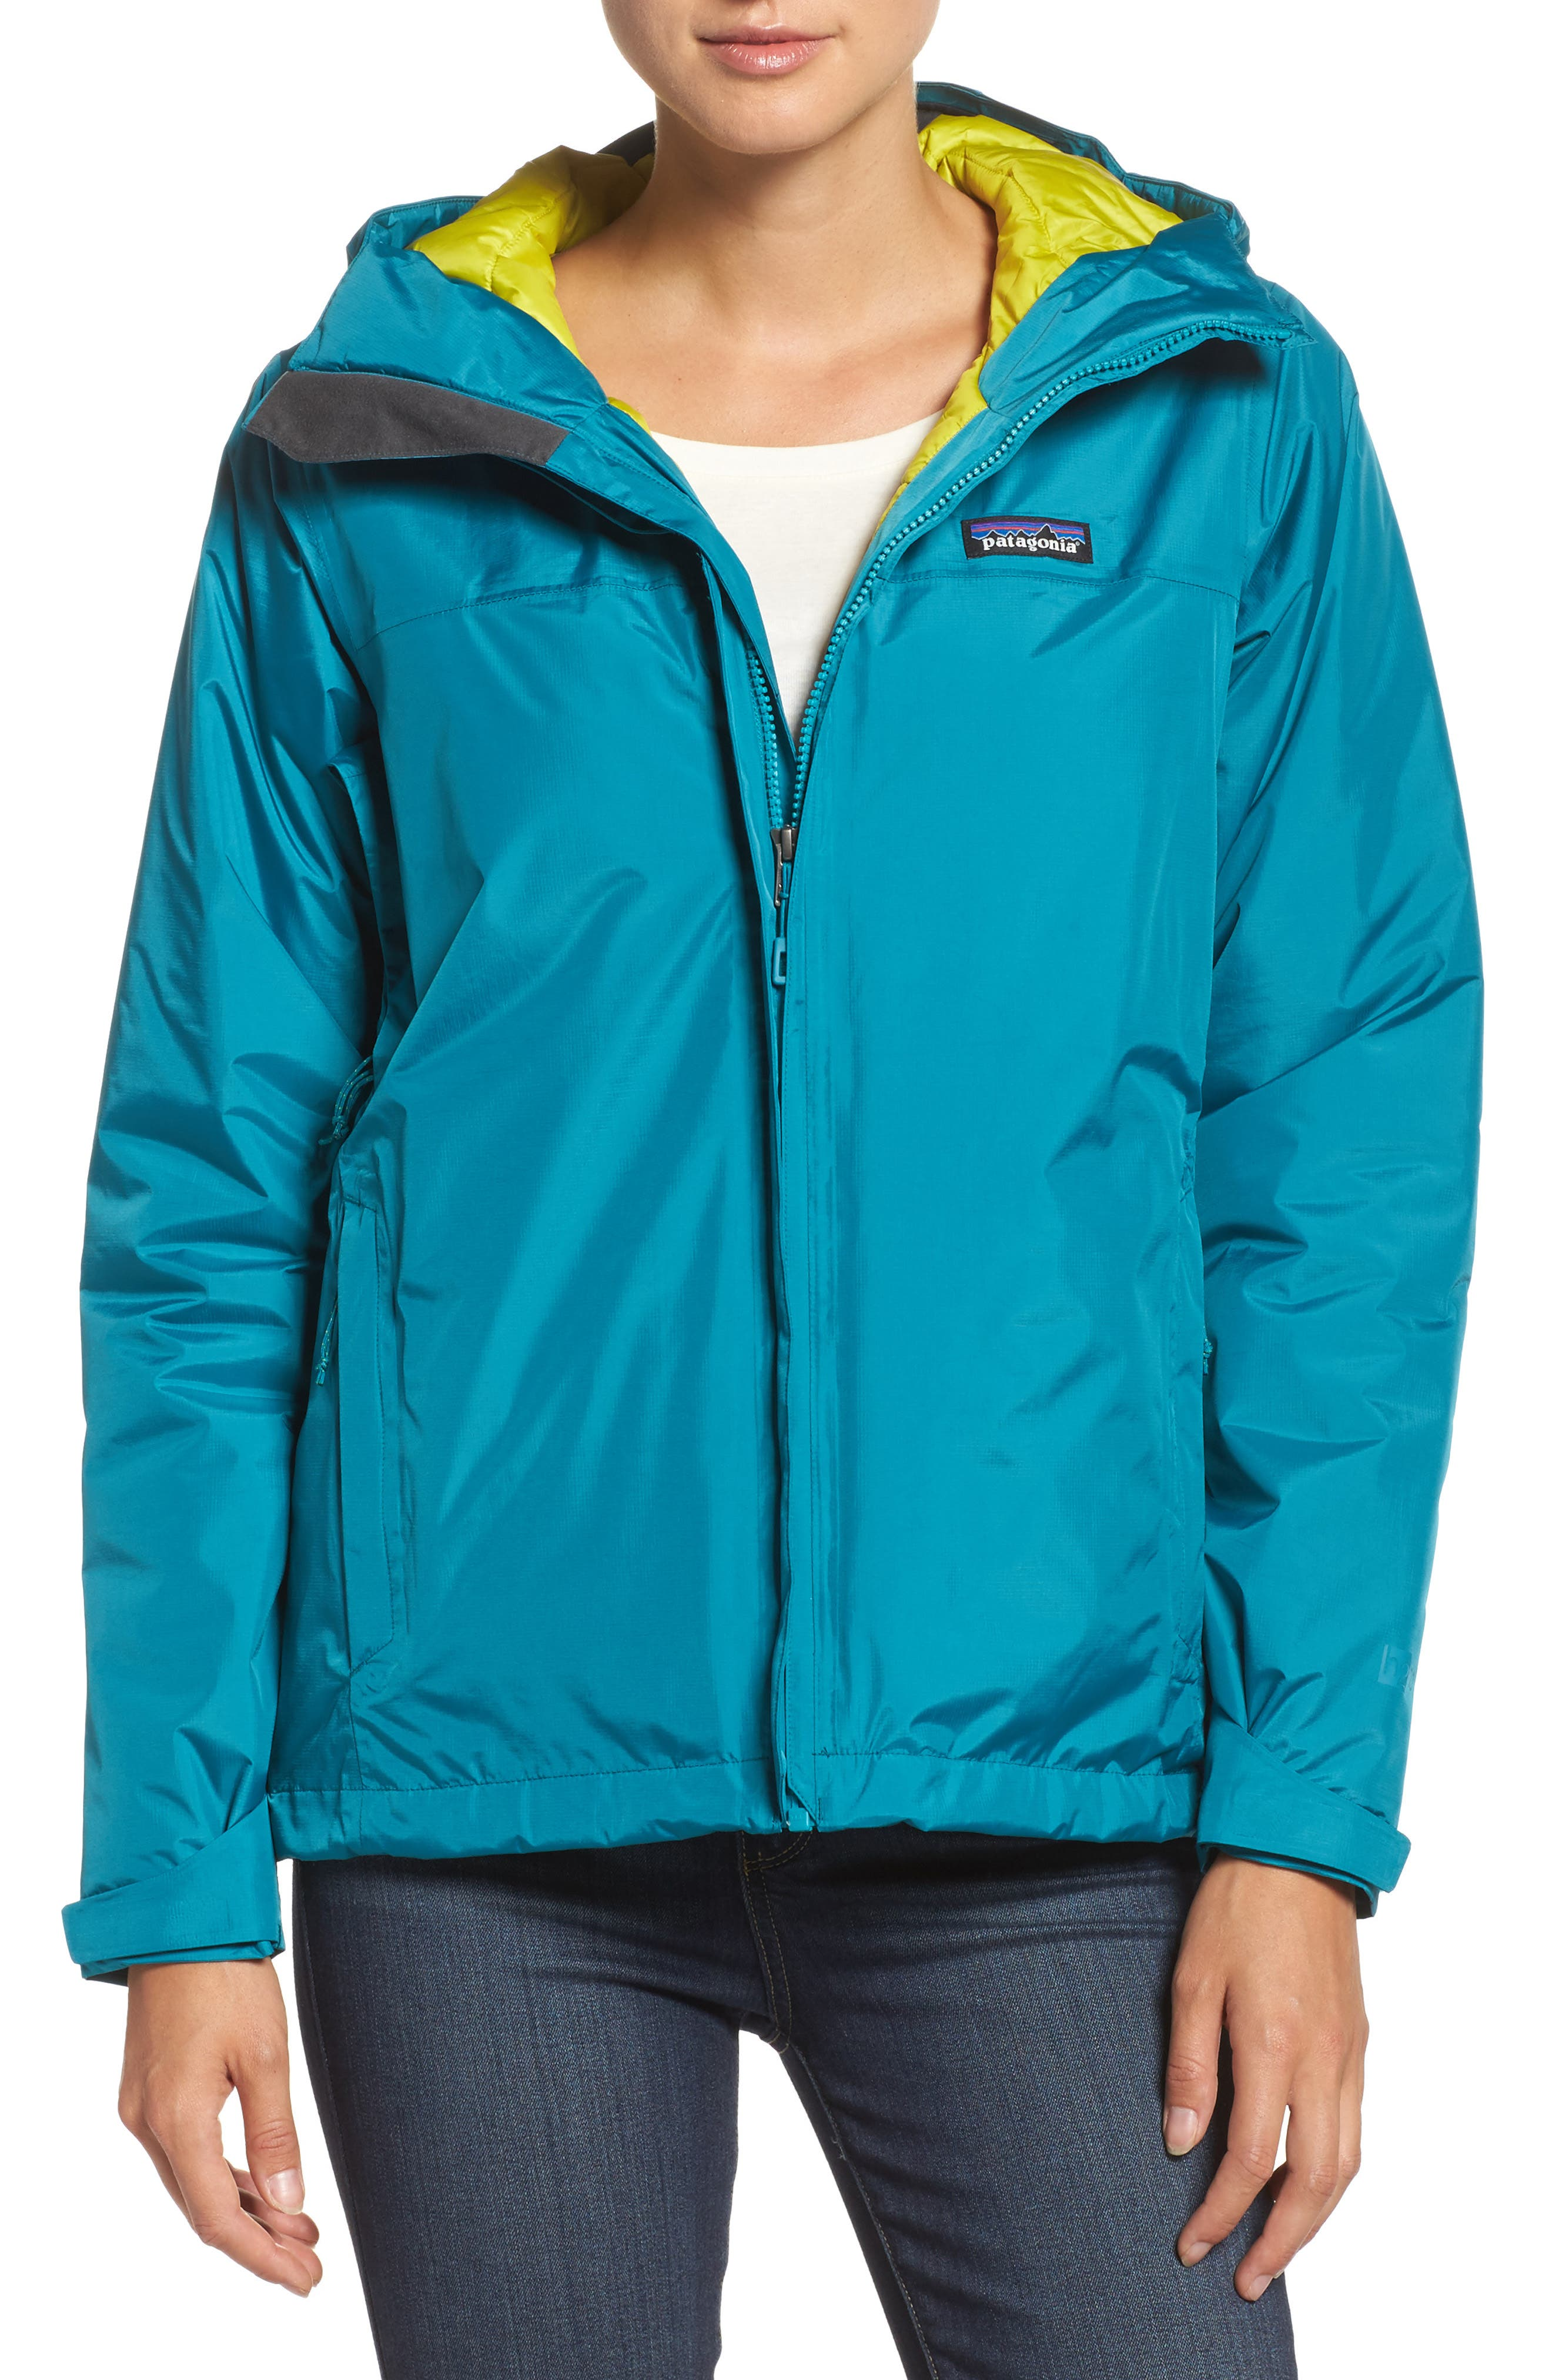 Main Image - Patagonia Torrentshell Packable Waterproof Insulated Jacket